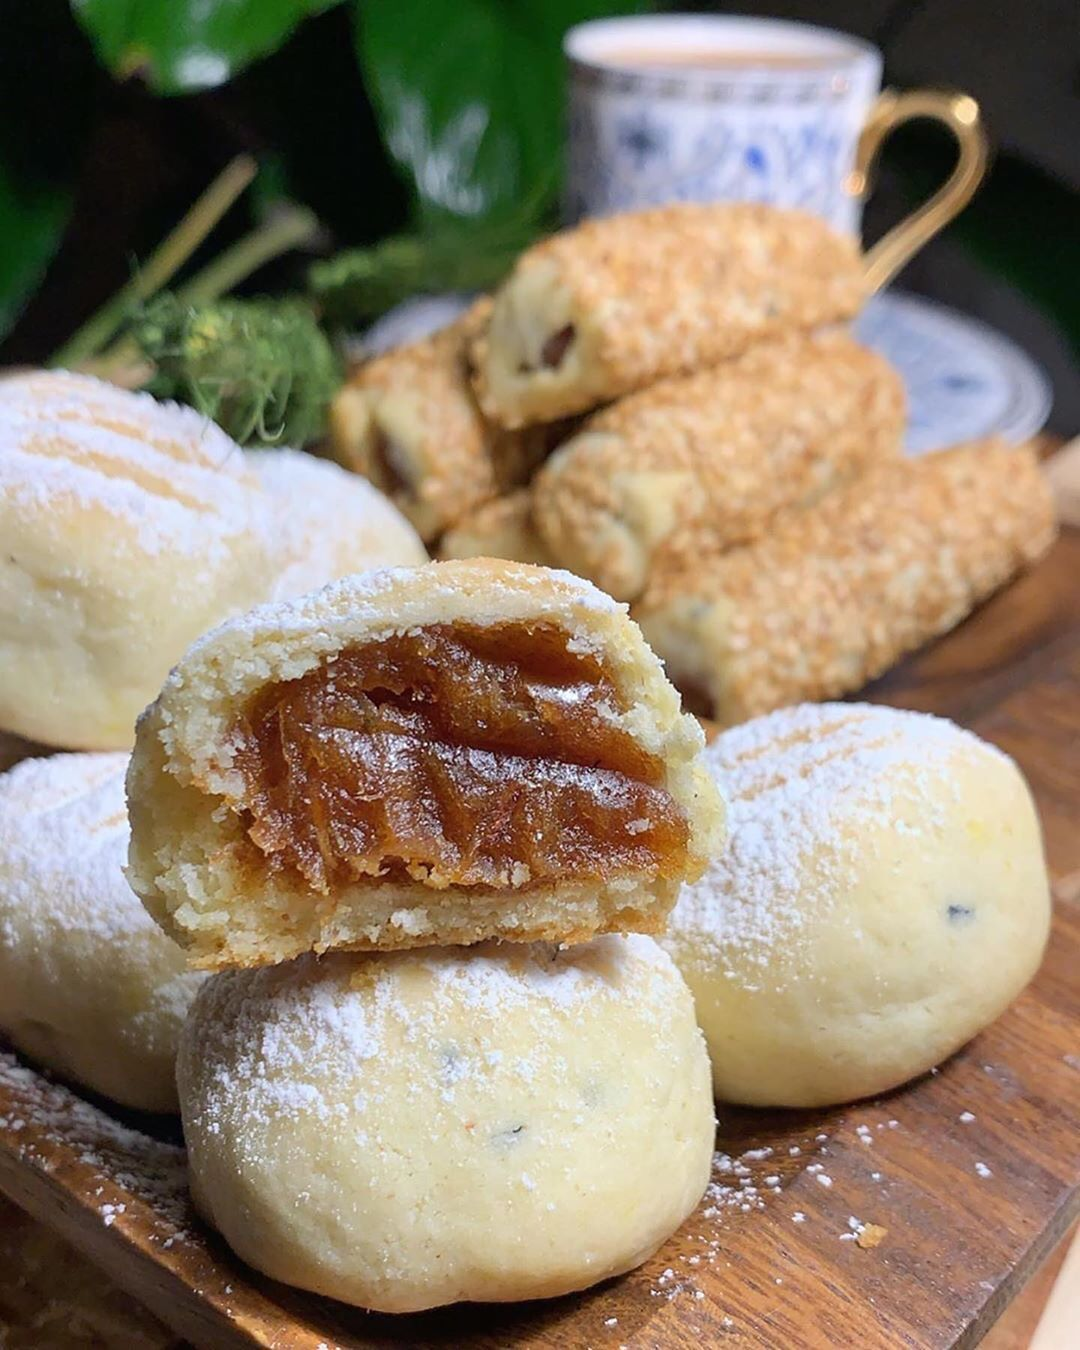 سنعات للحلويات On Instagram سنعآت Manosh معمول تمر كوب طحين ربع كوب سكر بودره ربع كوب حليب Arabic Sweets Recipes Sweets Recipes Recipes